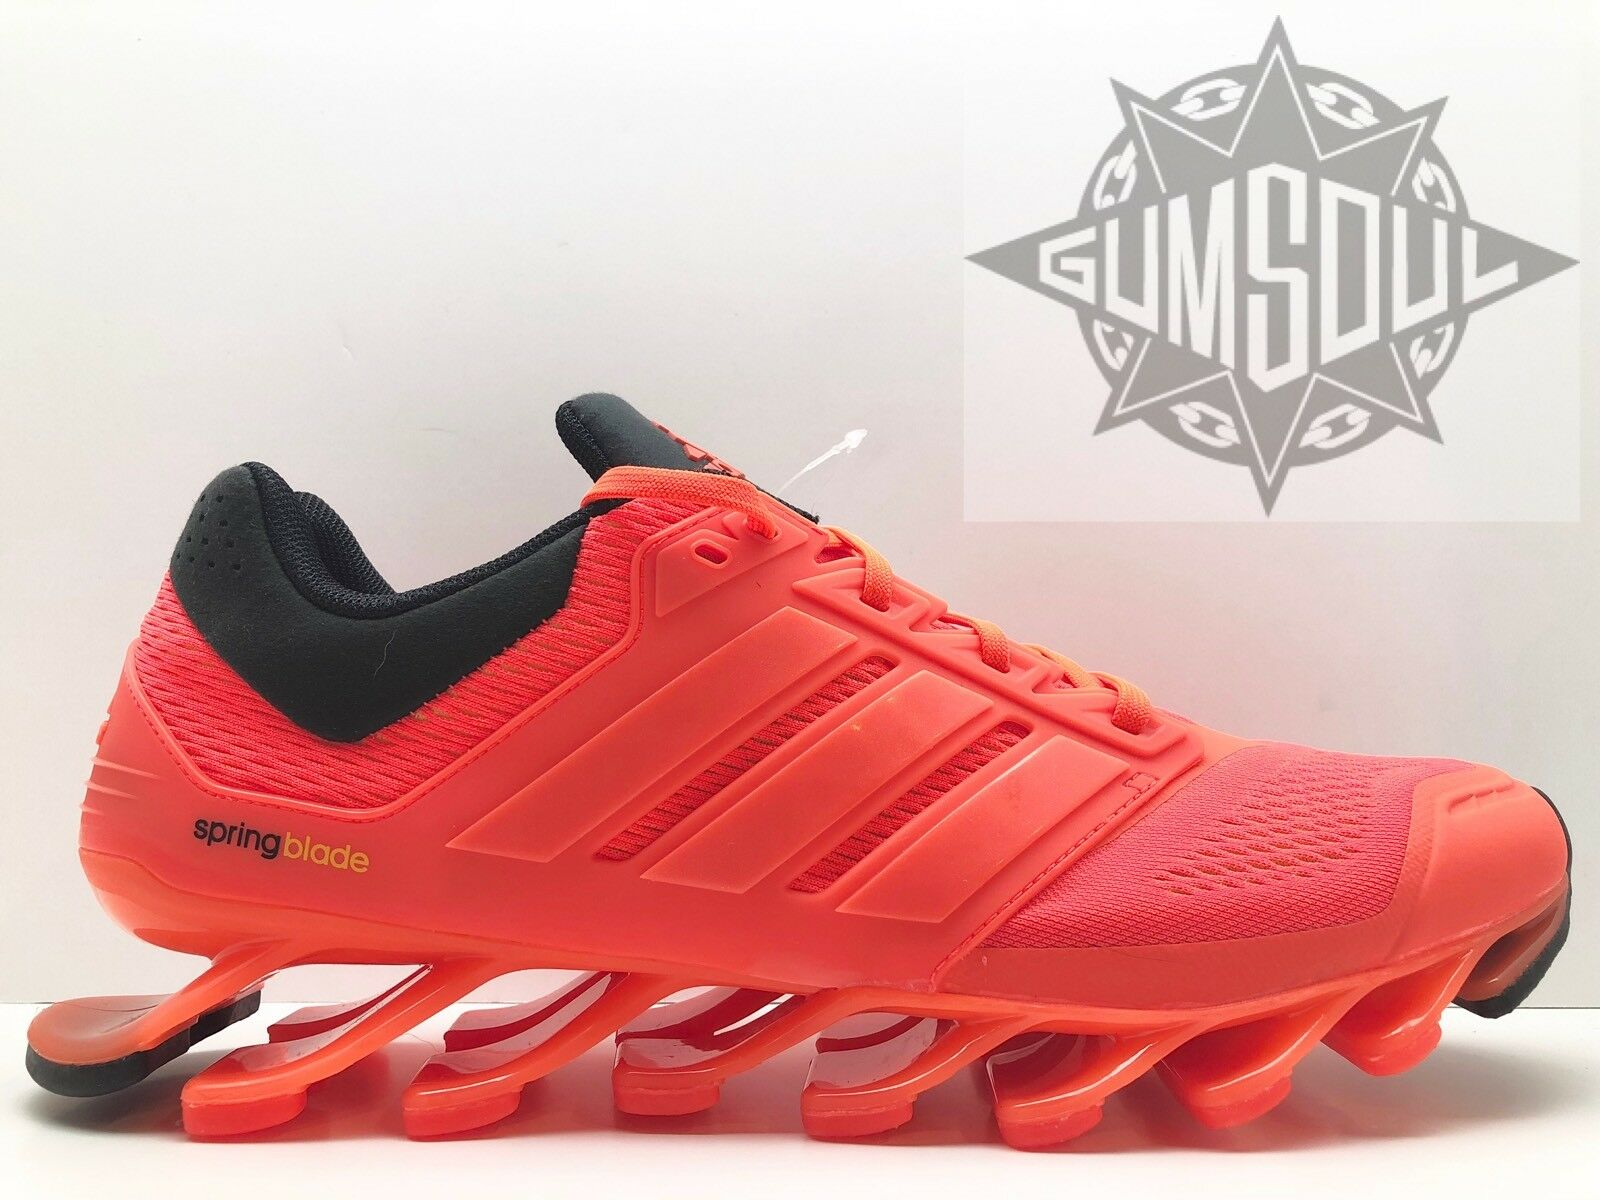 ADIDAS SPRINGBLADE M SOLAR RED BLACK D73957 sz 11